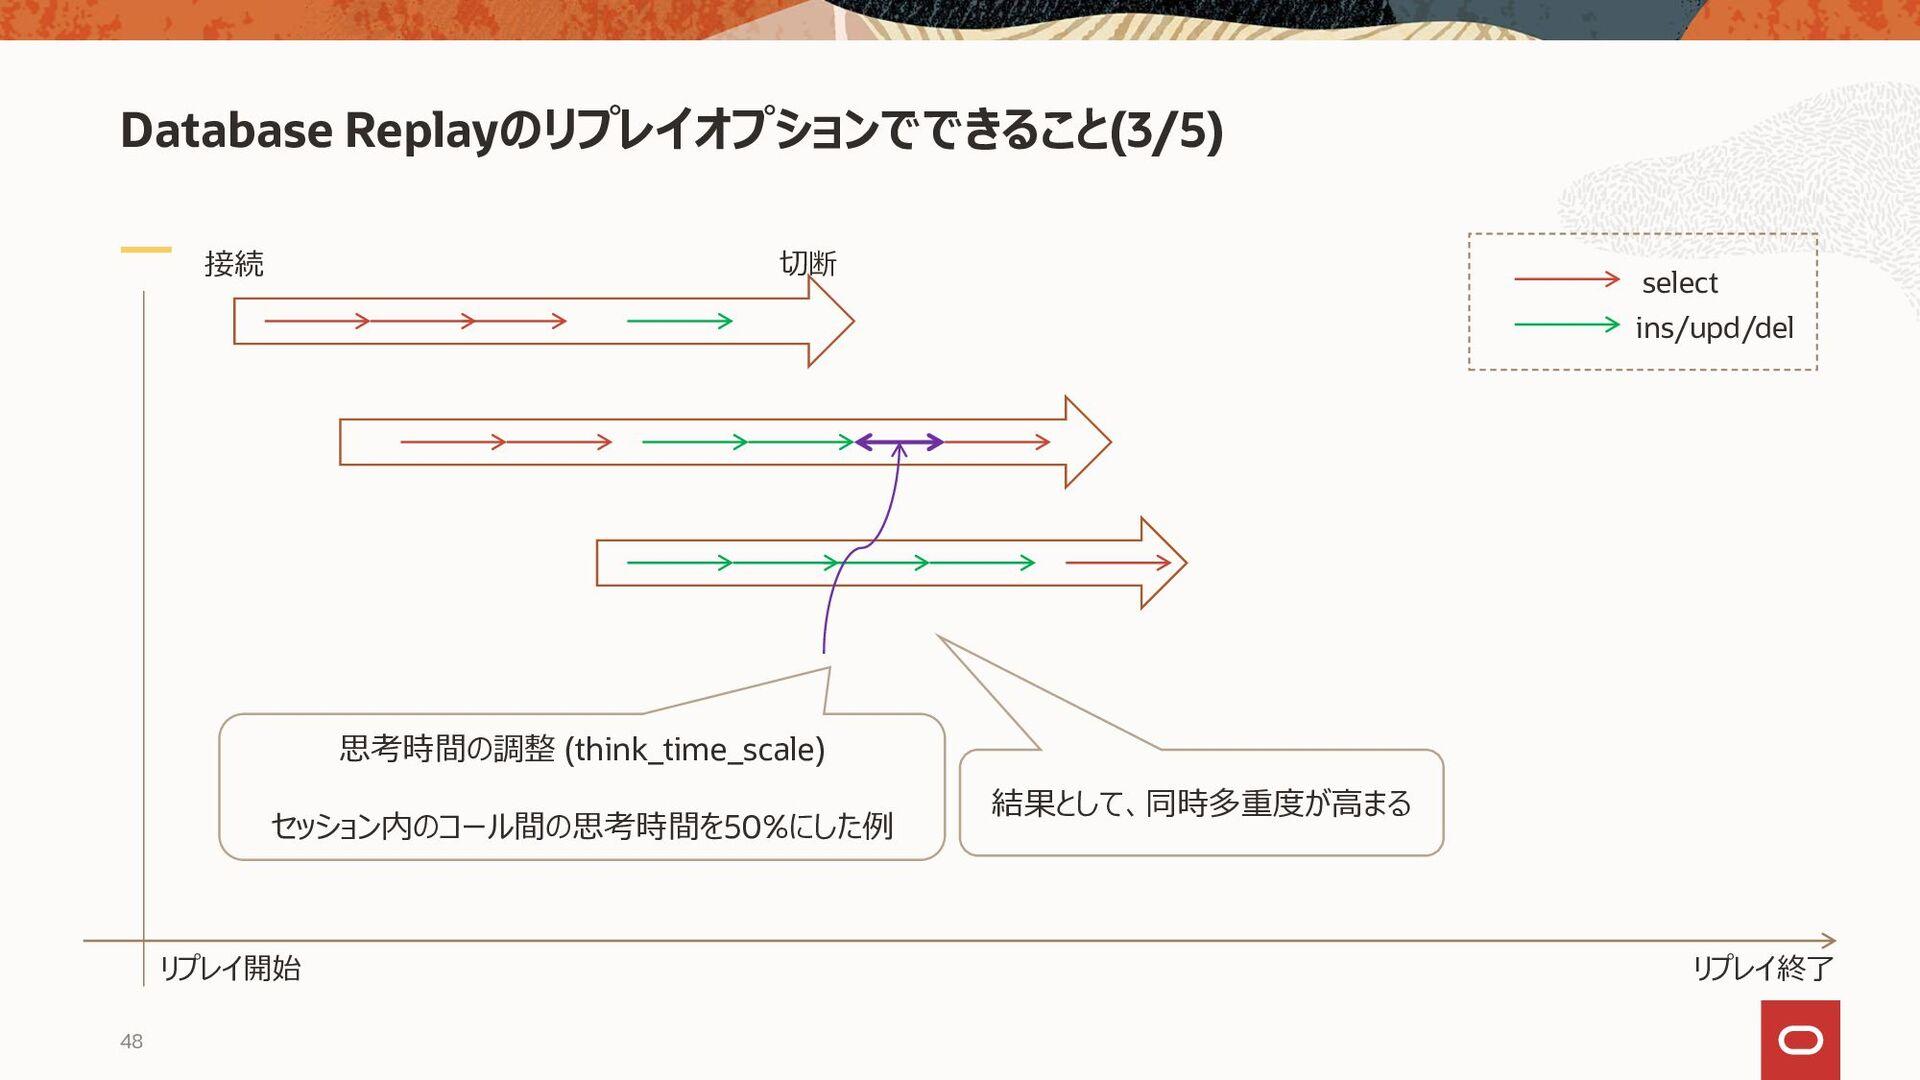 Database Replayのリプレイオプションでできること(4/5) 接続 切断 リプレイ...